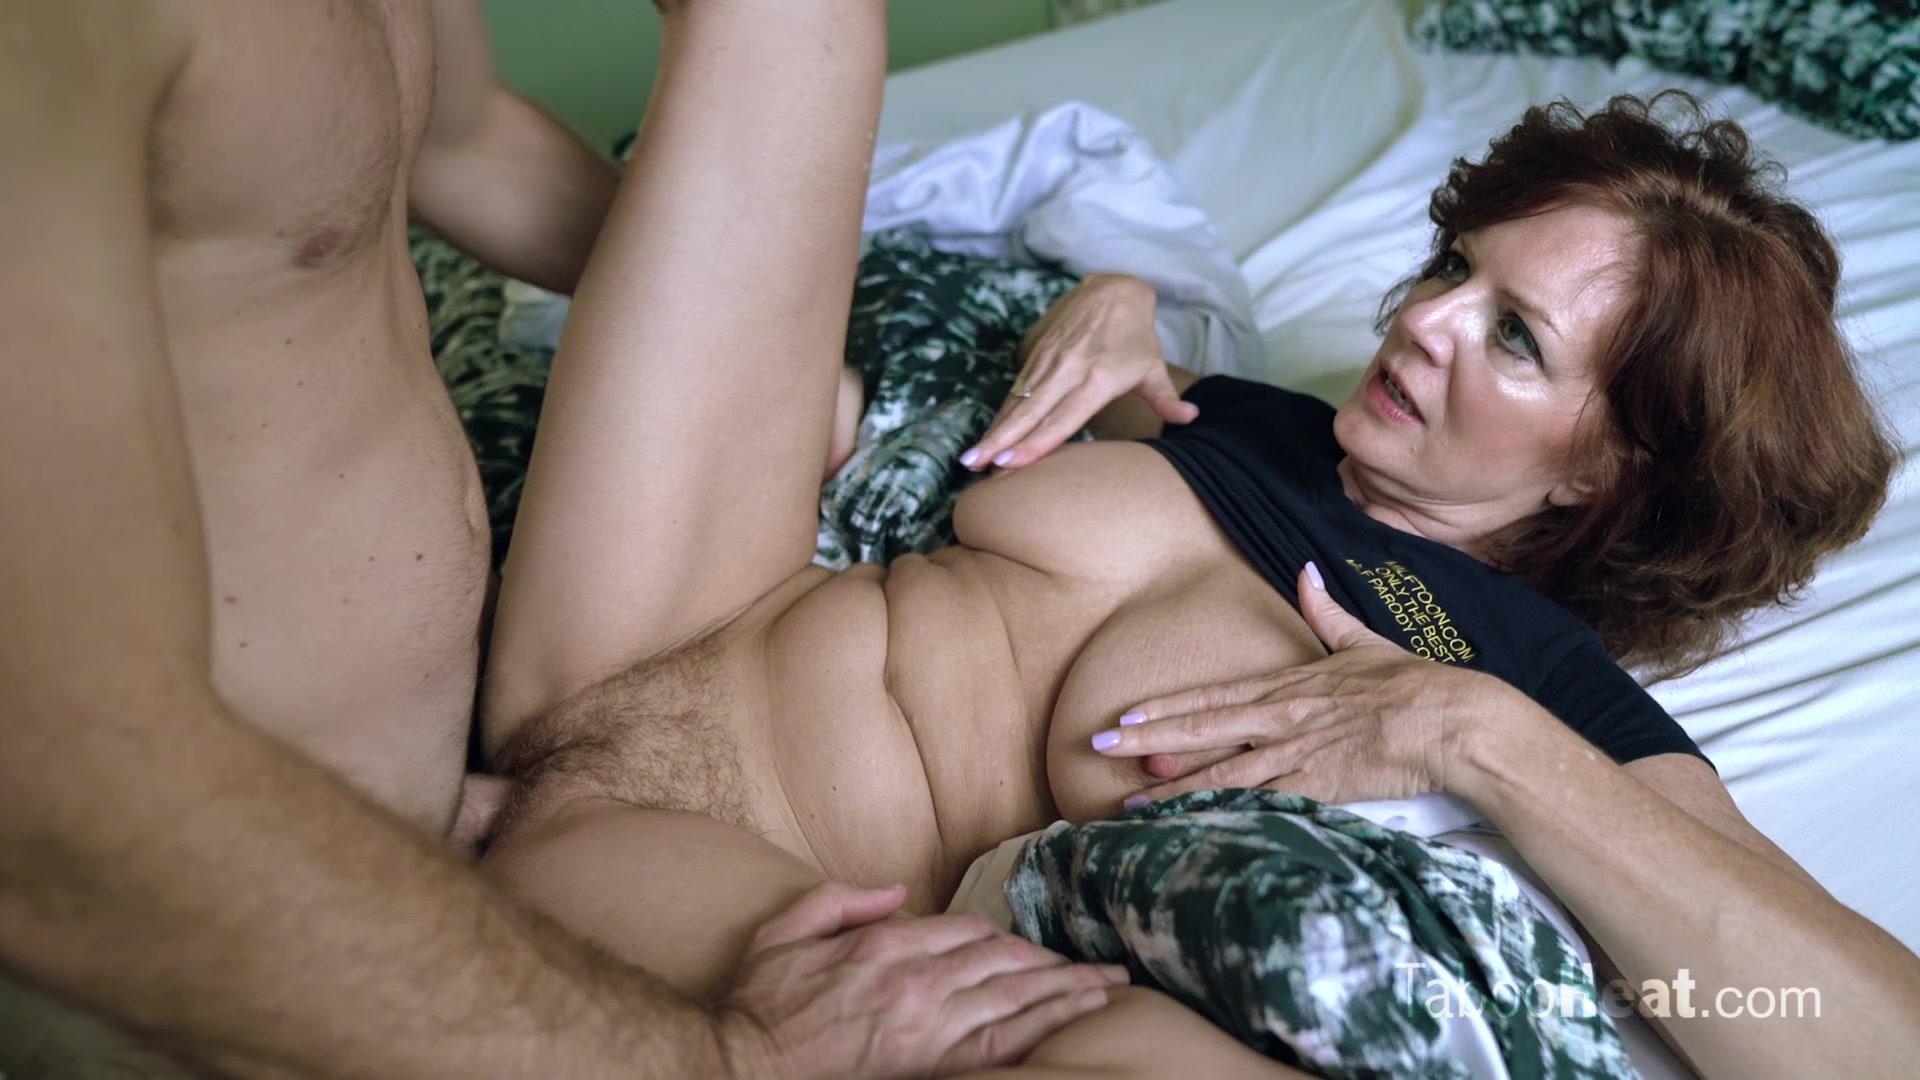 Free widow mom porn pics